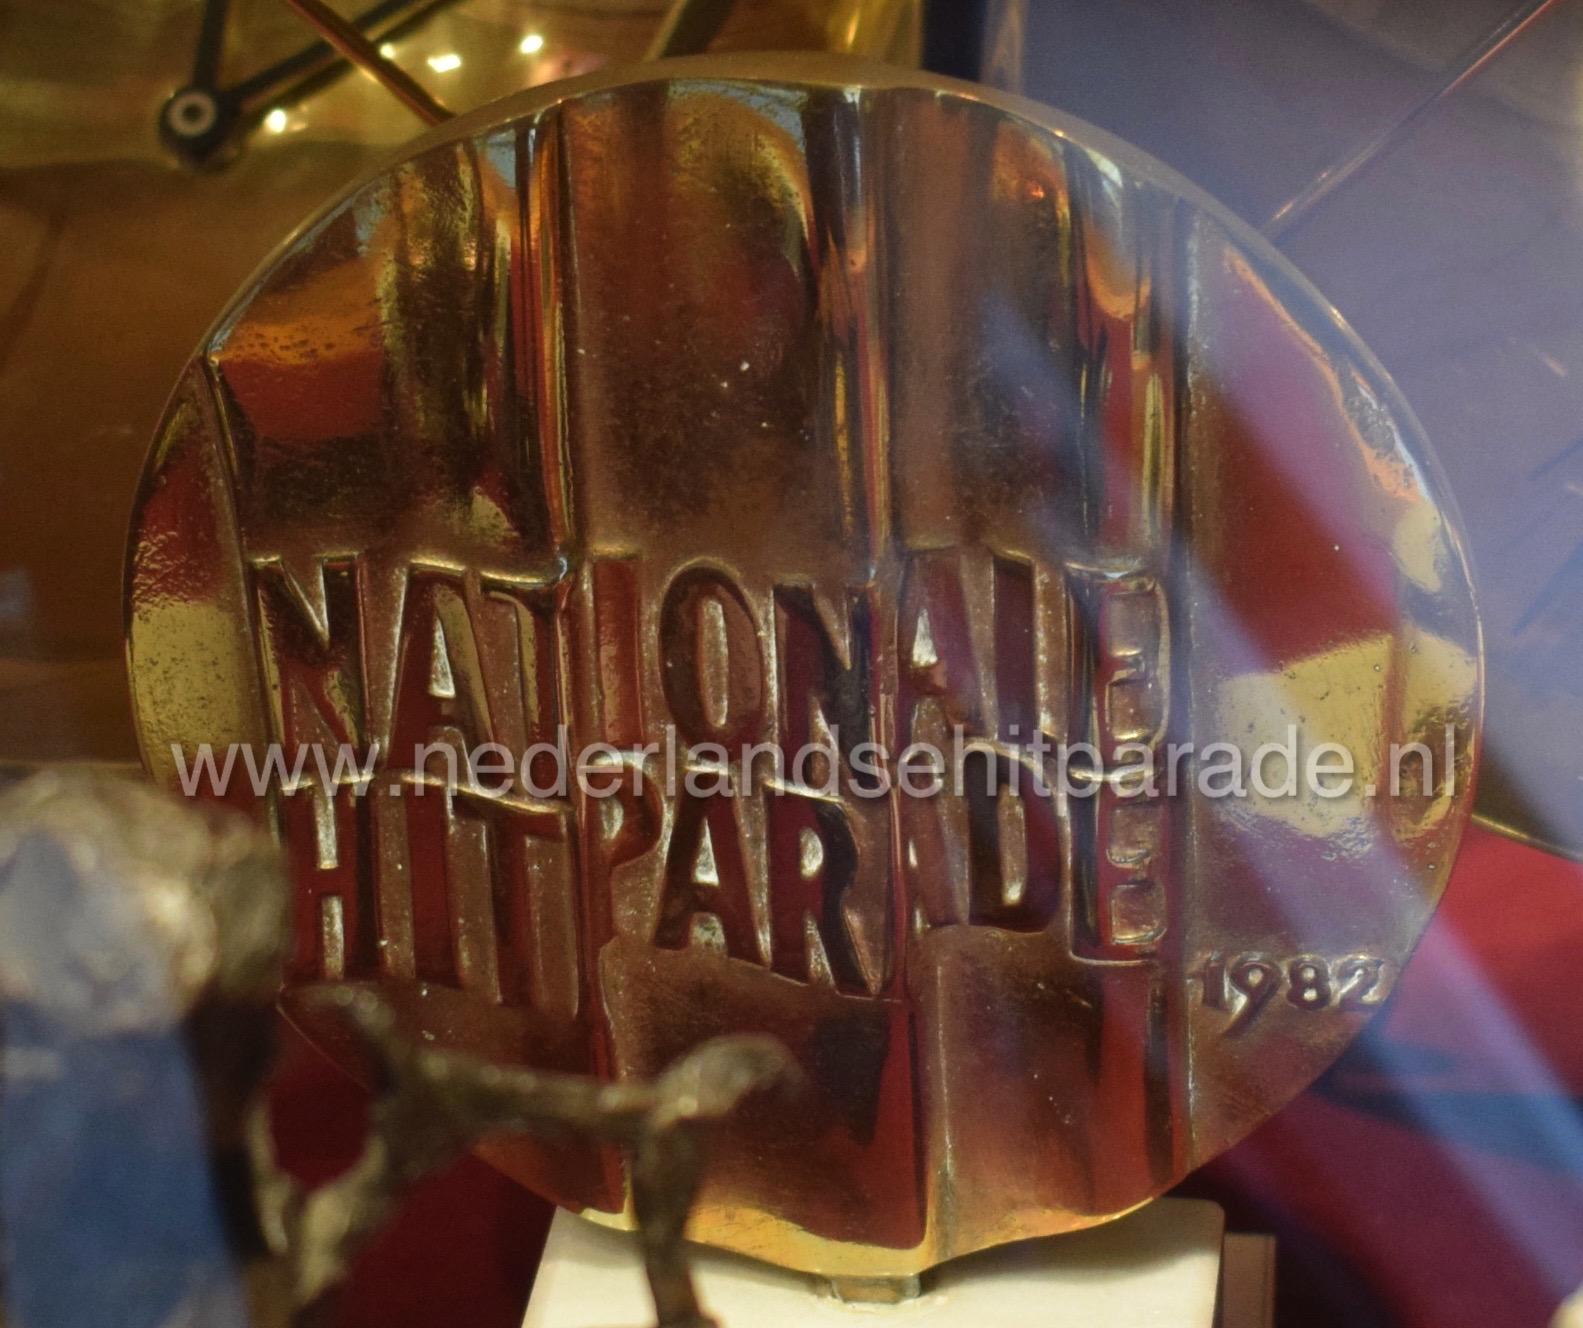 Nationale hitparade award BZN 1982.